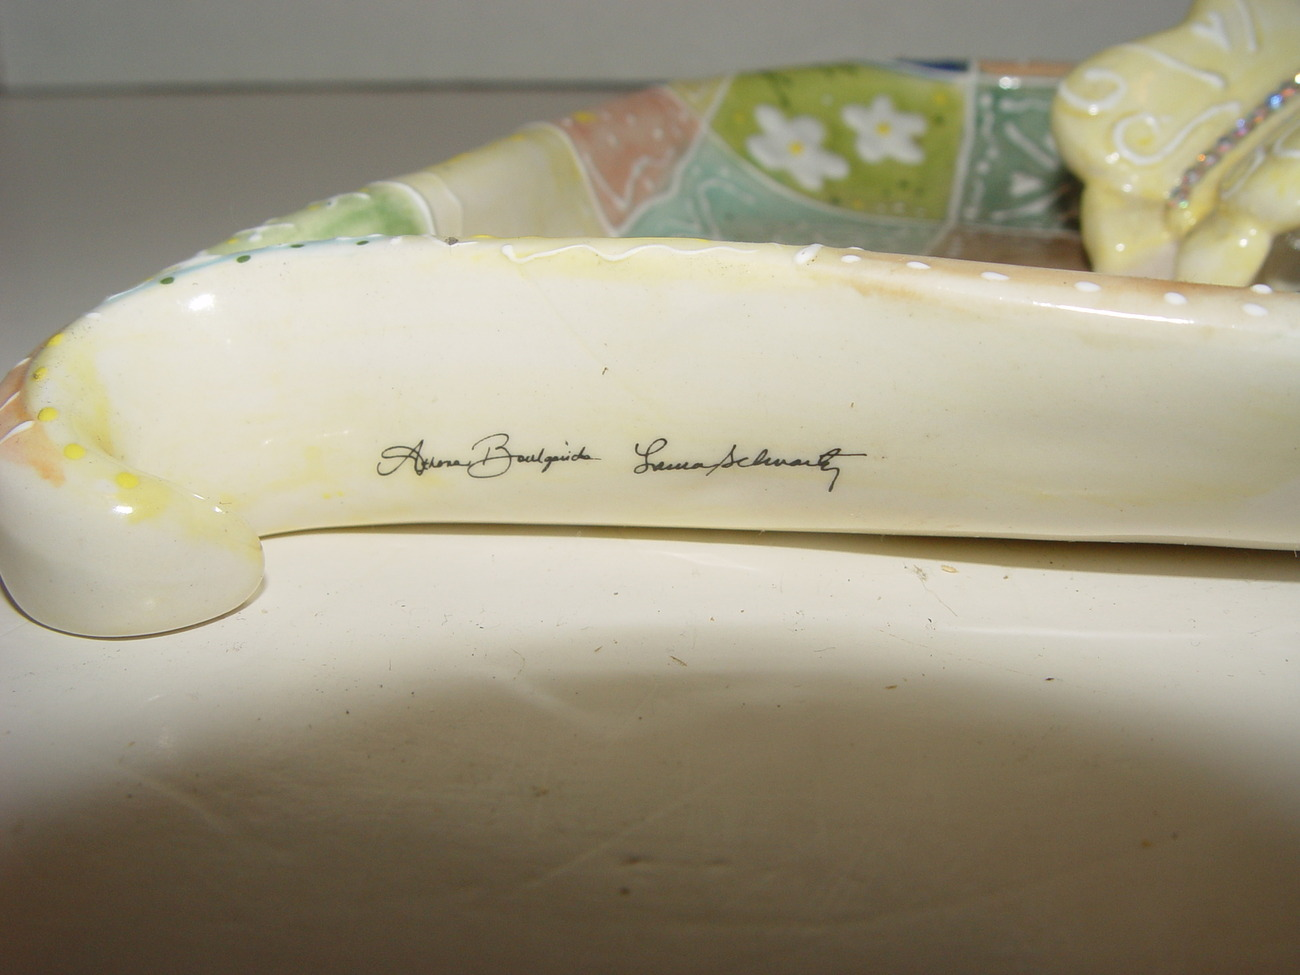 KOKO Originals Butterfly Ceramic (Signed byOriginal Founders) 2002